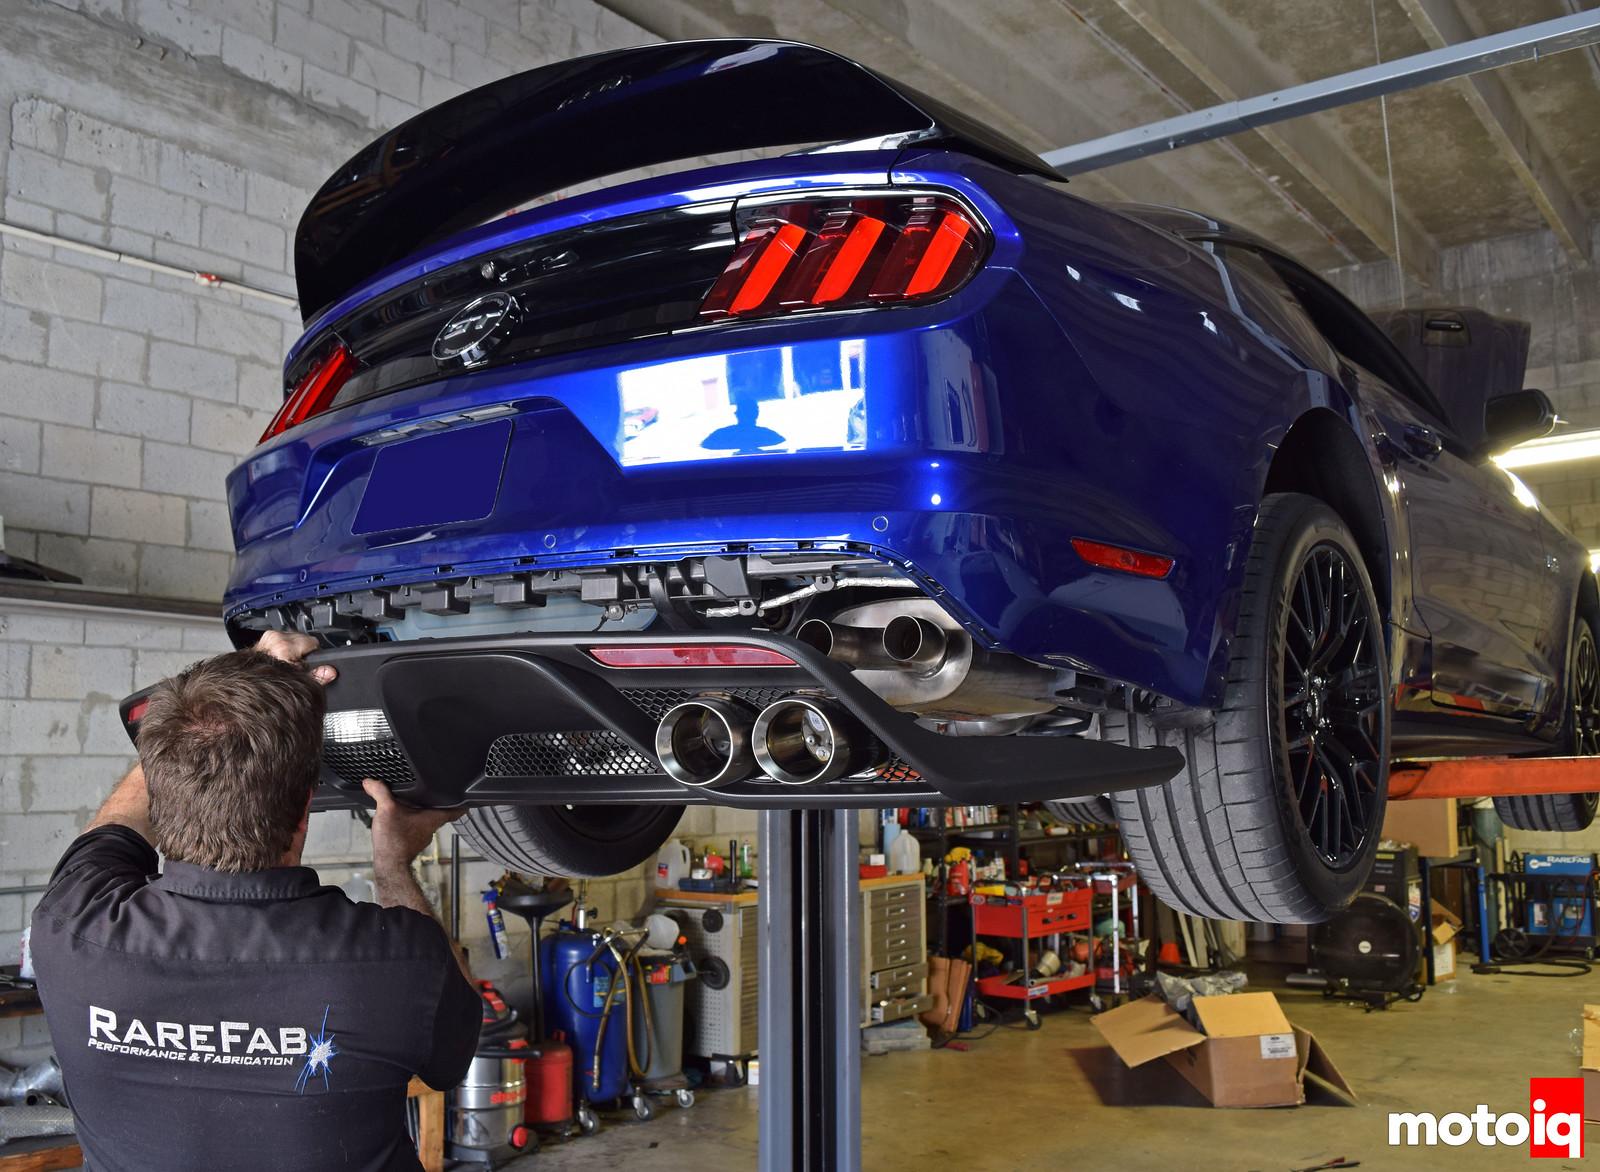 Installing Shelby GT350 lower valence